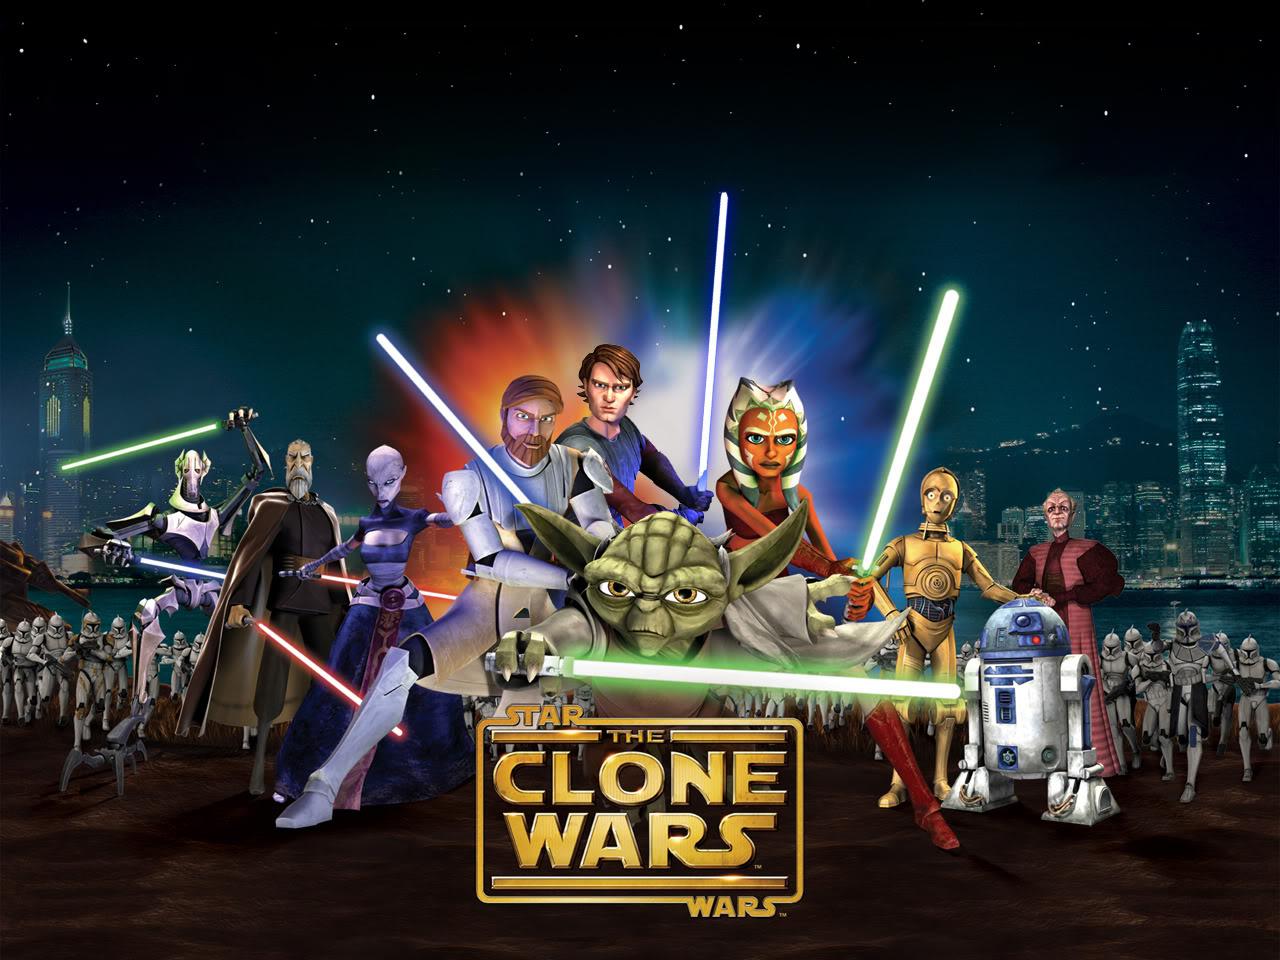 http://3.bp.blogspot.com/-ofK_EwcrGe0/UKcTyX9syoI/AAAAAAAAAgU/abyW-_HpJPU/s1600/Star-Wars-The-Clone-Wars.jpg